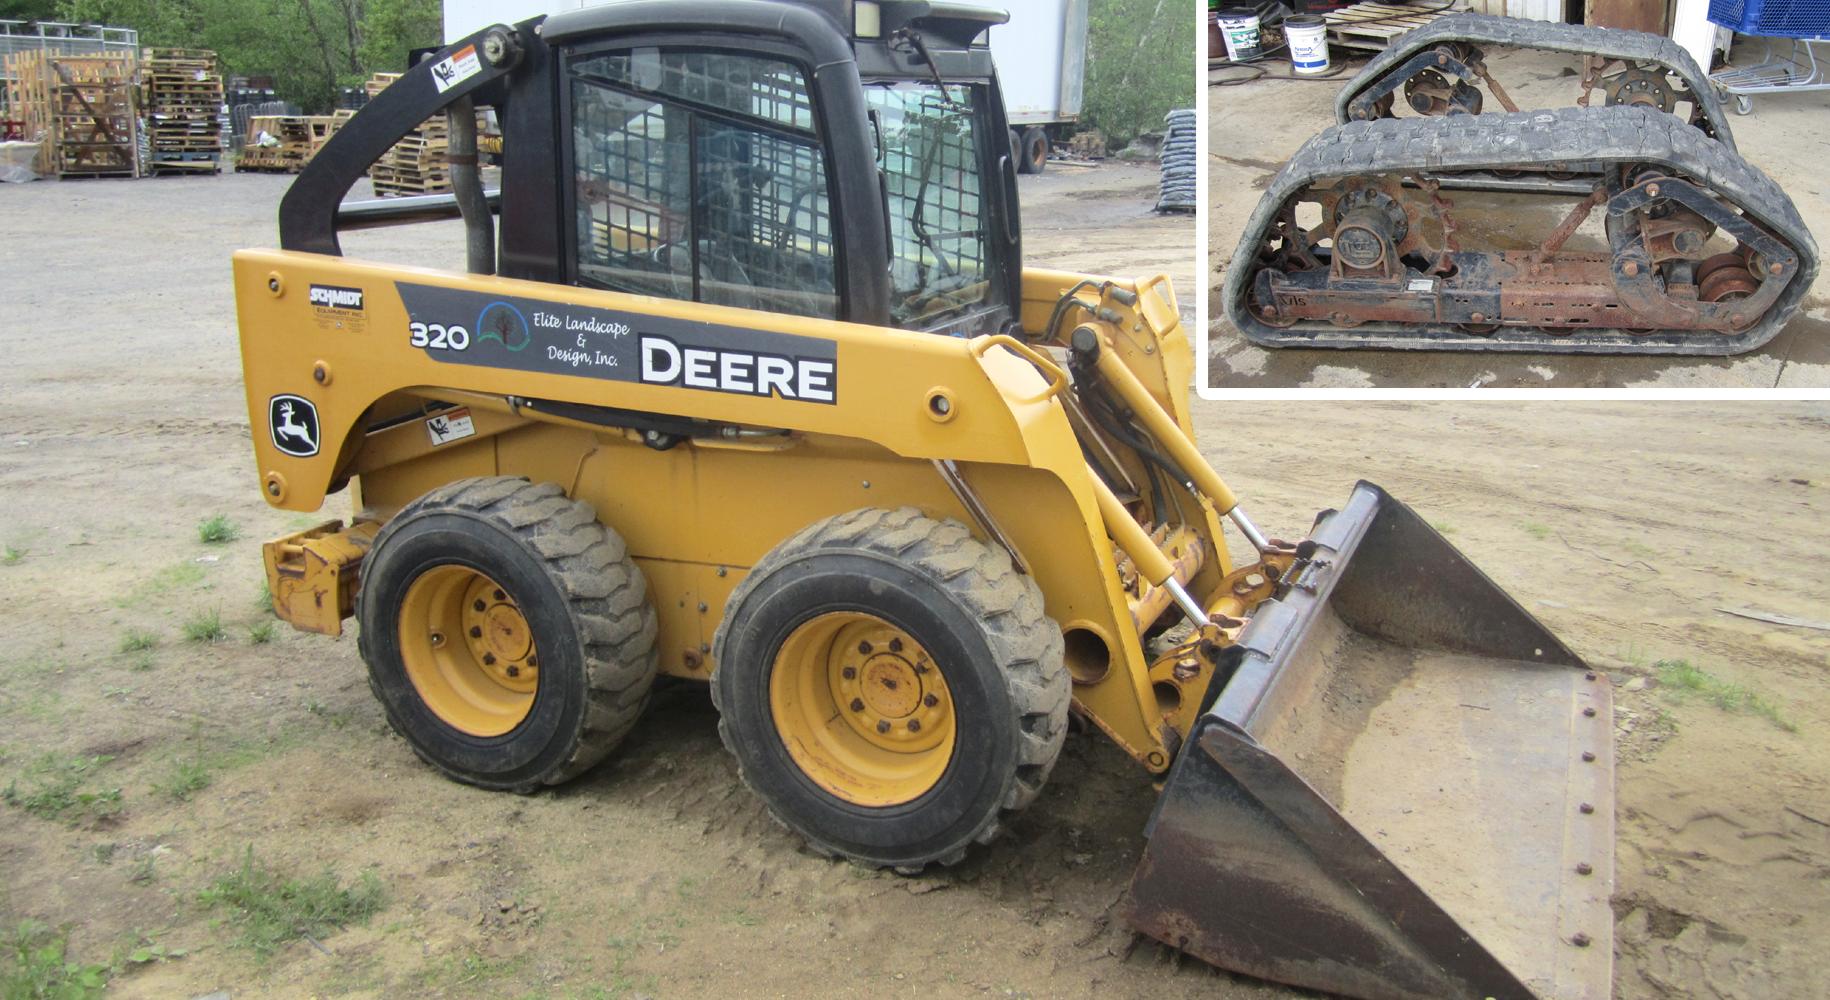 tractors \u0026 equipment, outdoor power tools, service \u0026 repair, apparel John Deere 320 Accessories 2007 john deere 320 cab skid steer